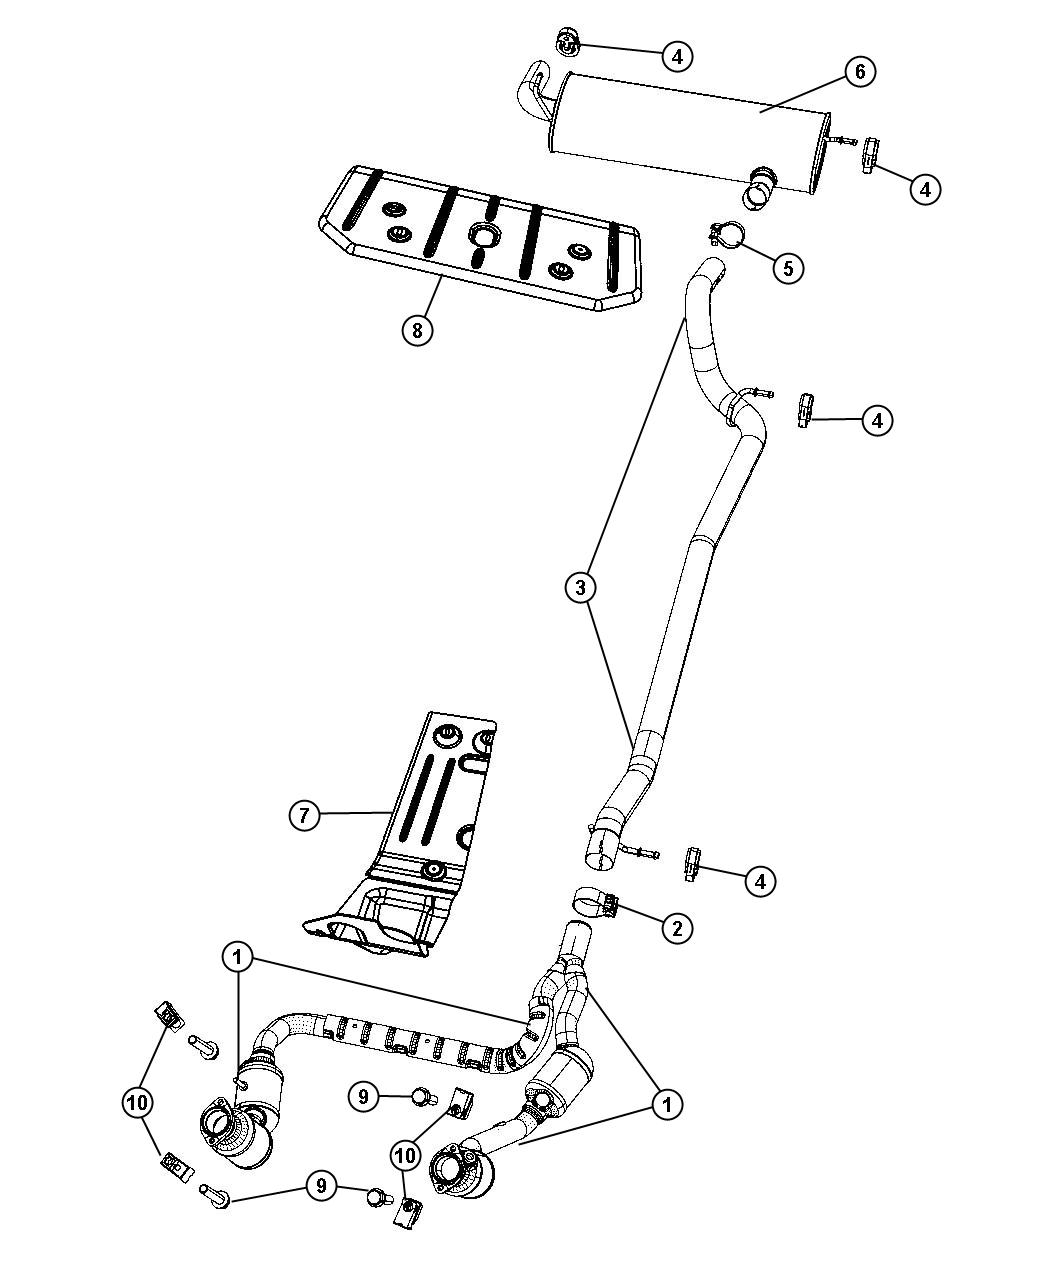 Jeep Wrangler Converter Exhaust System